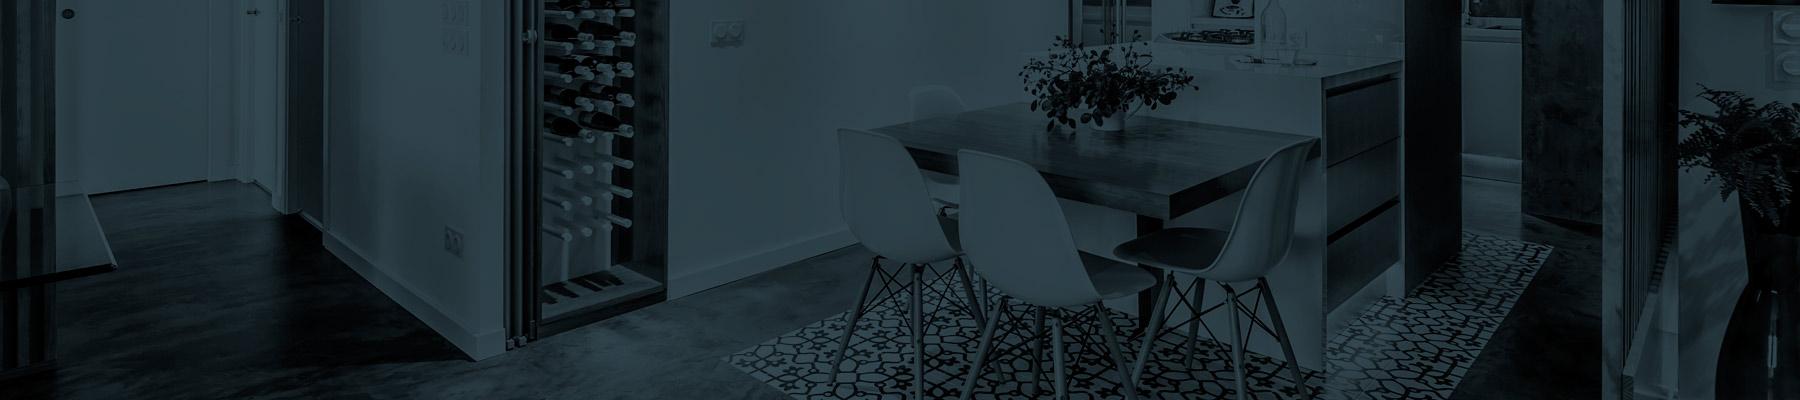 grupovalseco-reforma-vivienda-slider-171803